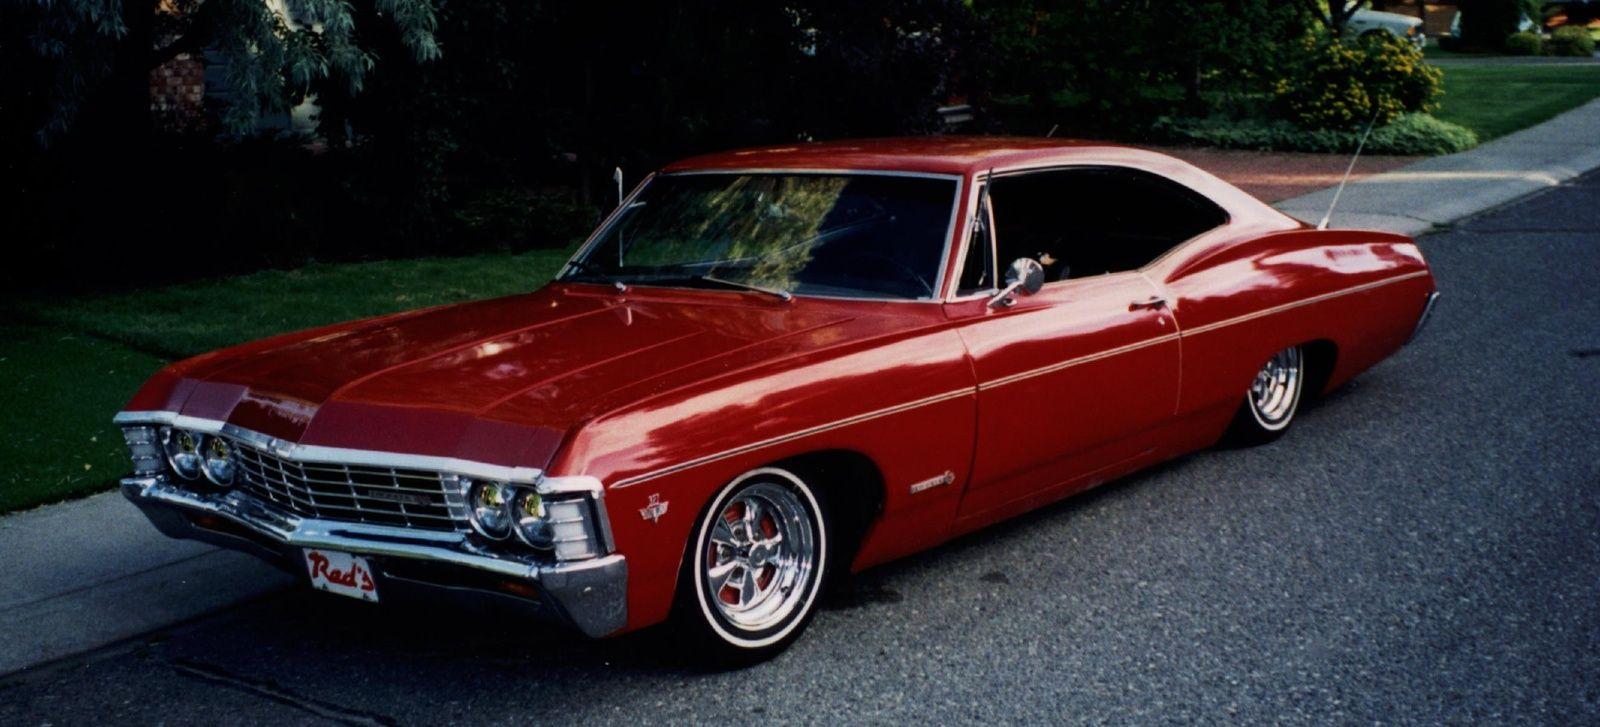 1967 Chevrolet Impala Picture Chevrolet Impala Chevy Impala 1967 Chevy Impala